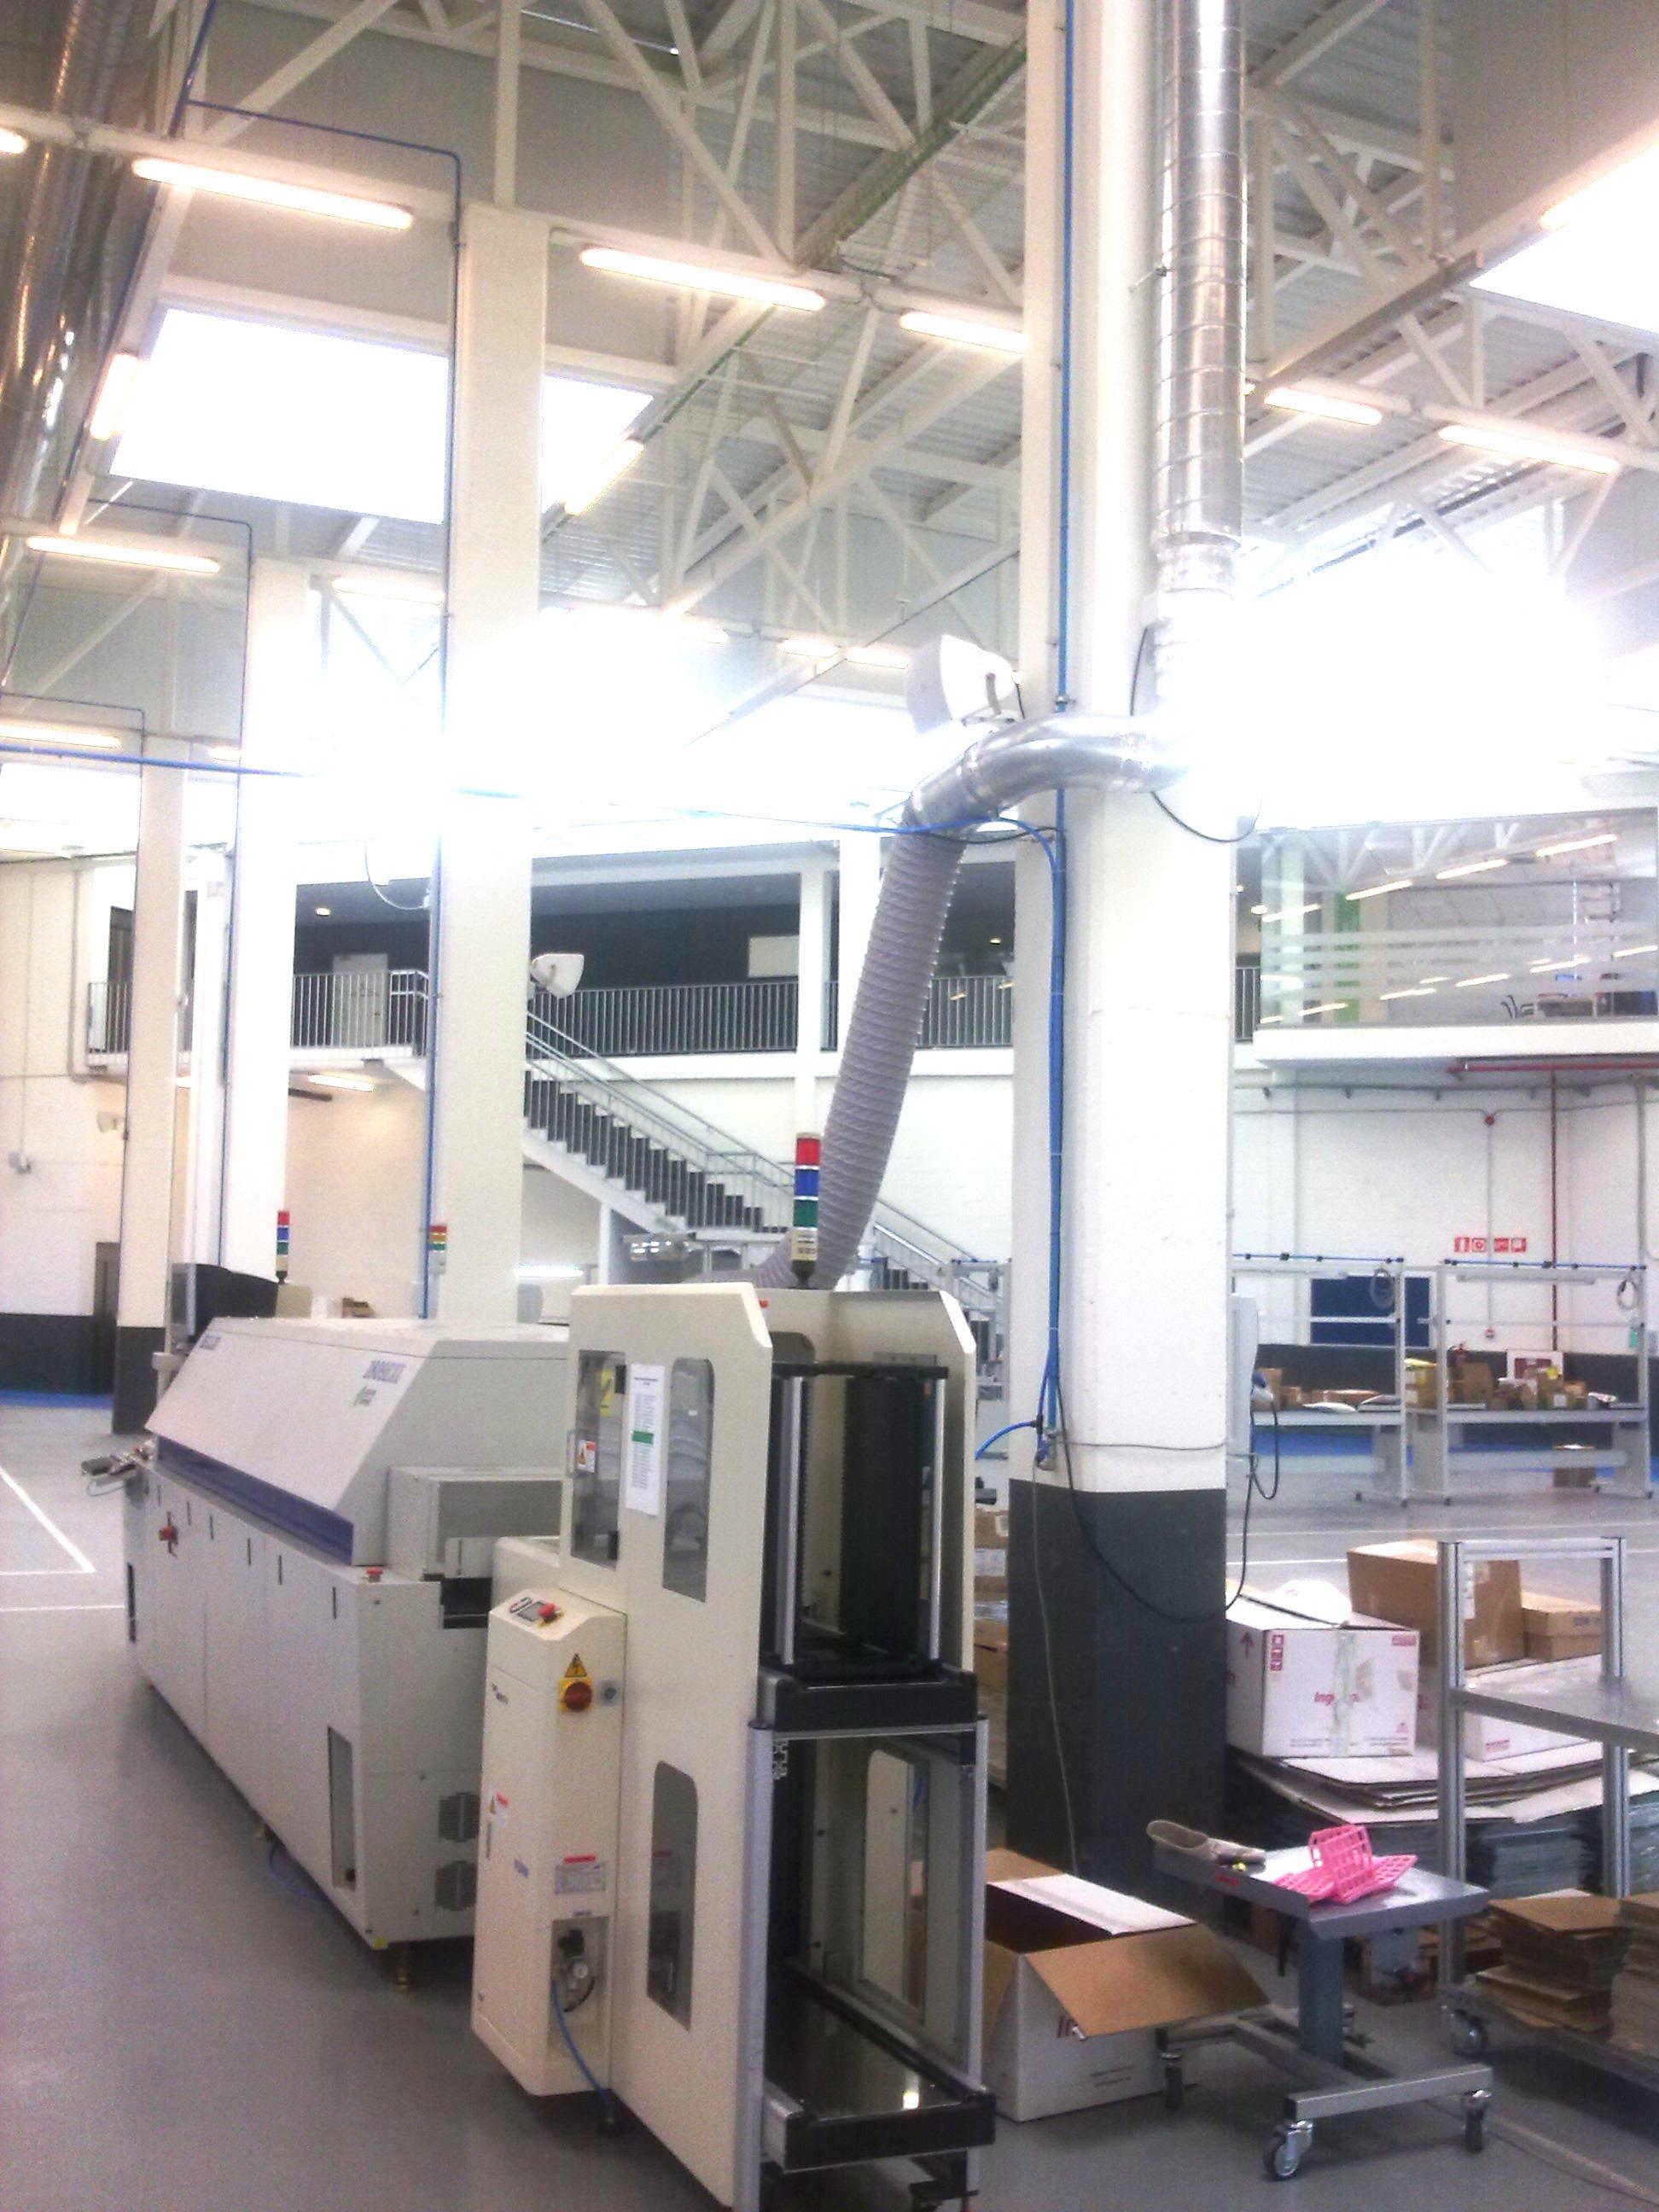 Sasyma erandio climatizaci n aire acondicionado sala for Maquinas de aire acondicionado baratas